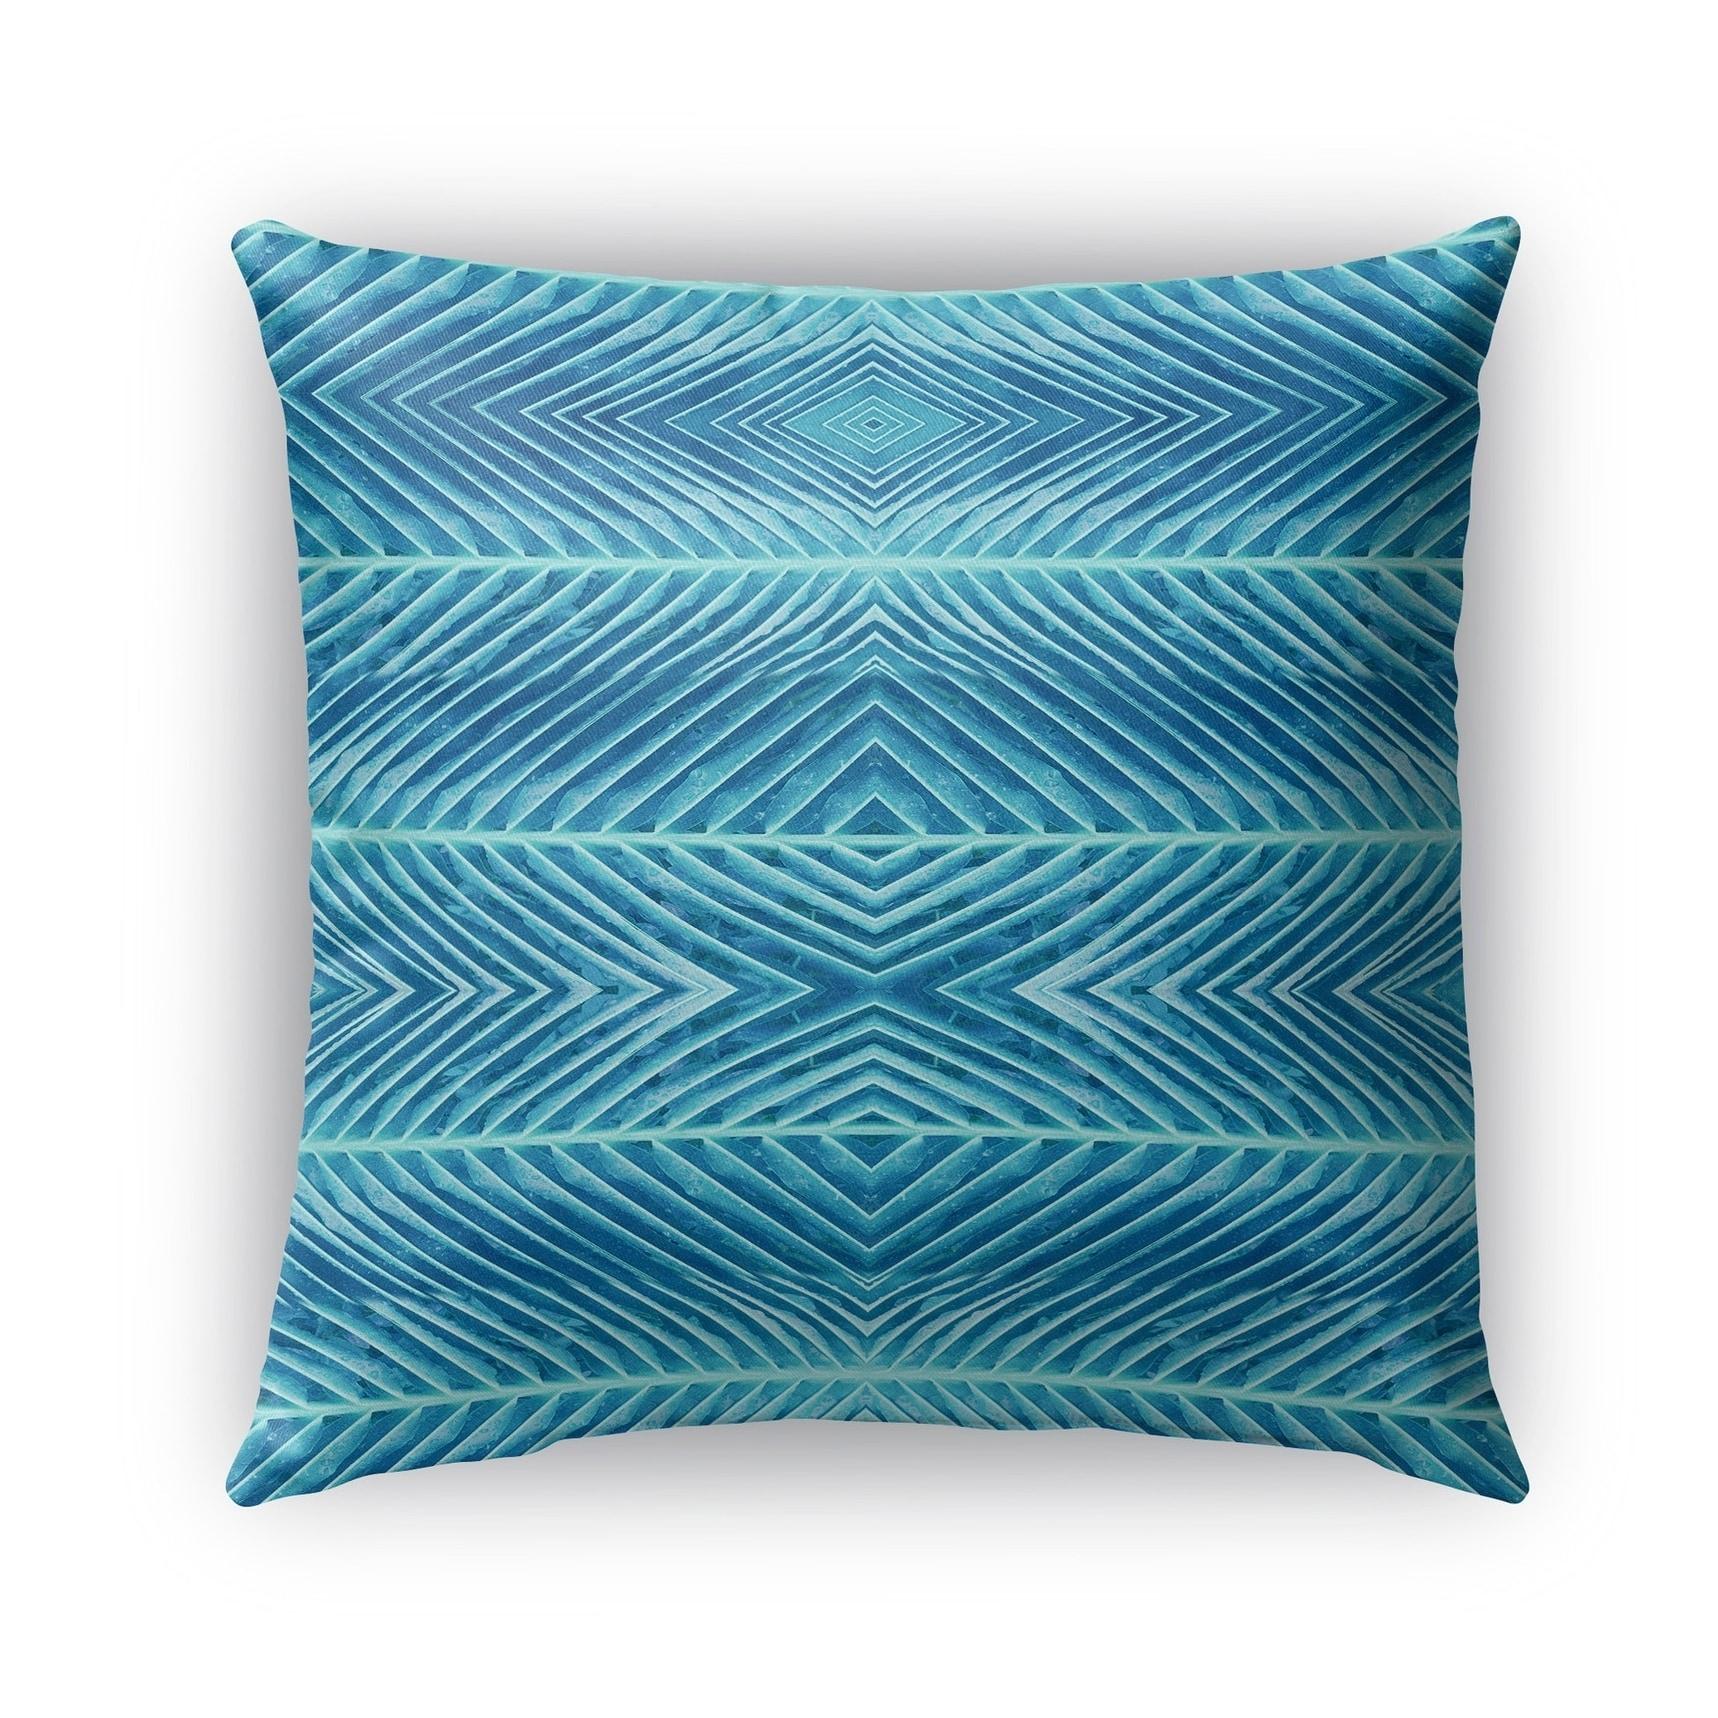 Kavka Designs blue blue palms outdoor pillow with insert (16 x 16)